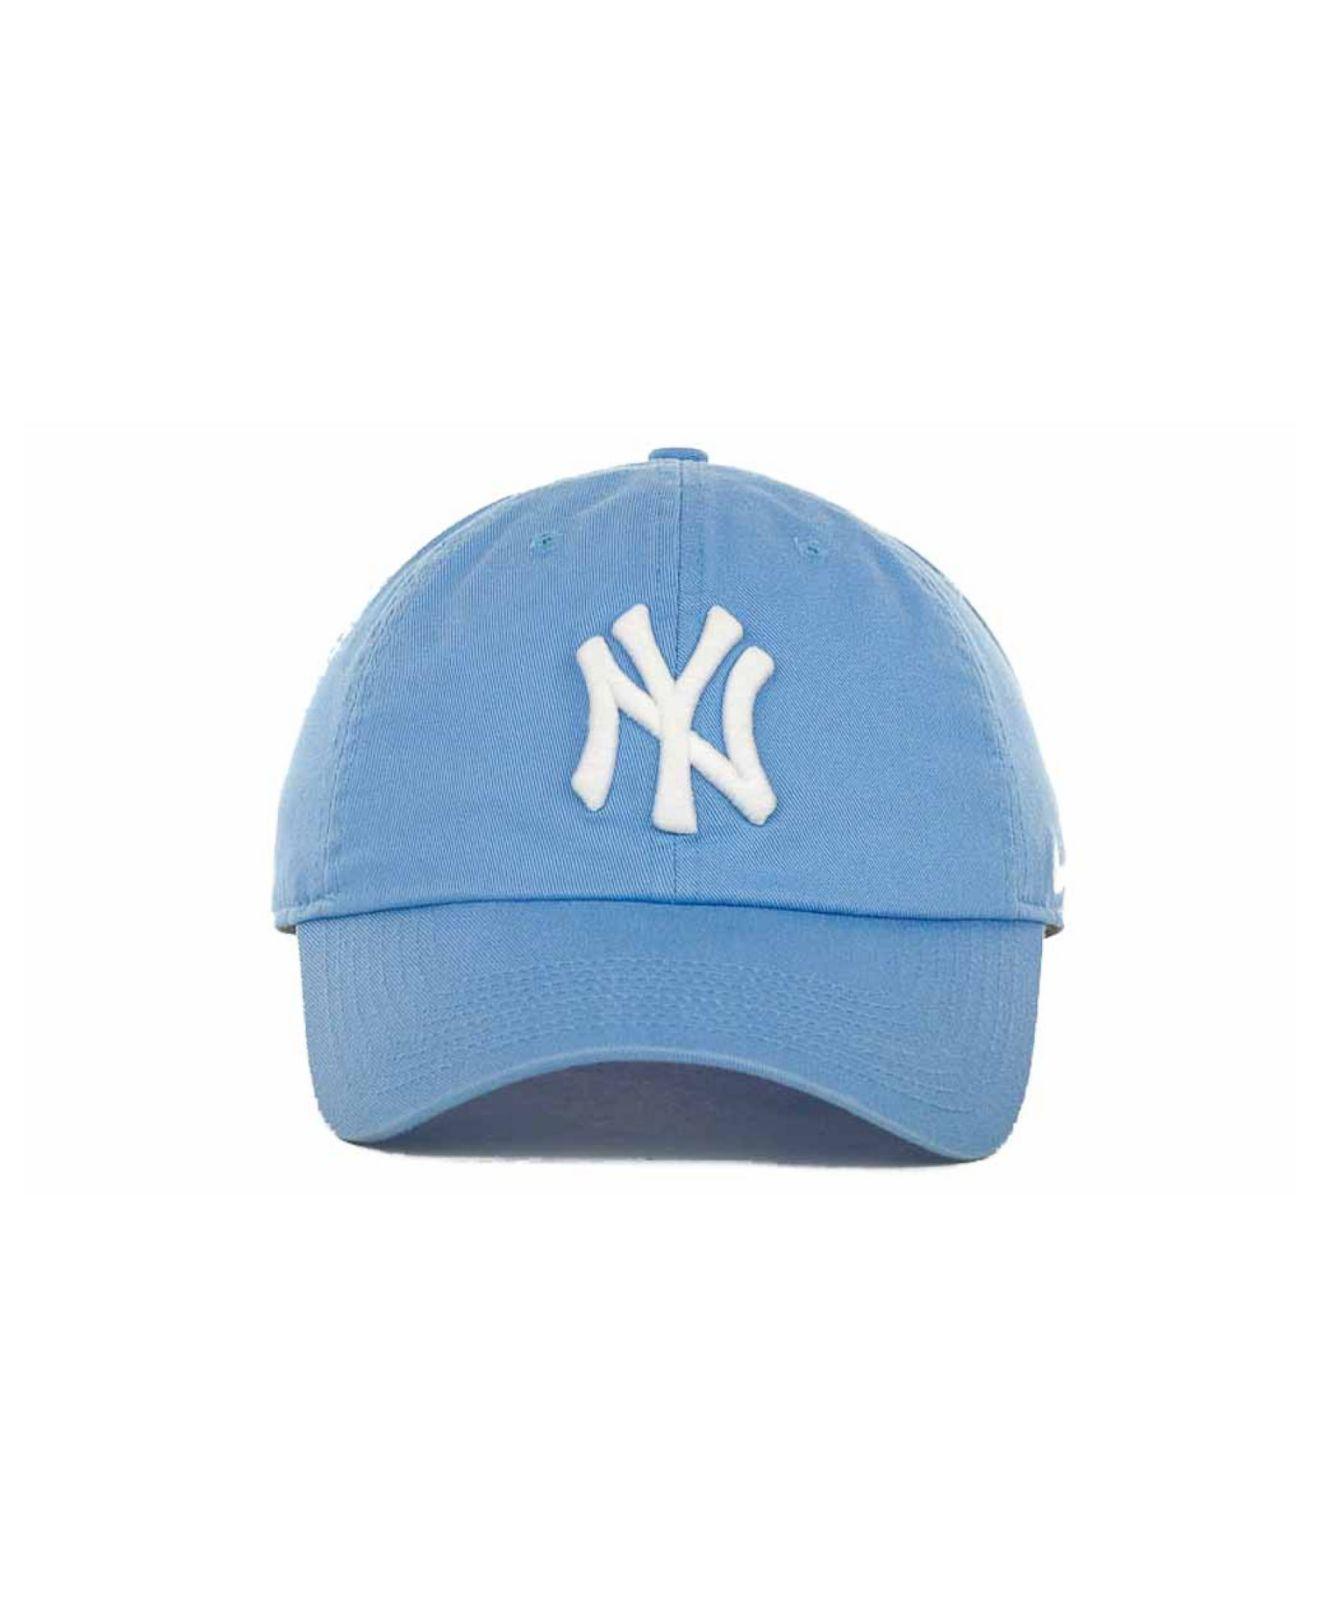 560844c6 ... promo code for lyst nike womens new york yankees stadium cap in blue  77314 f8a3c